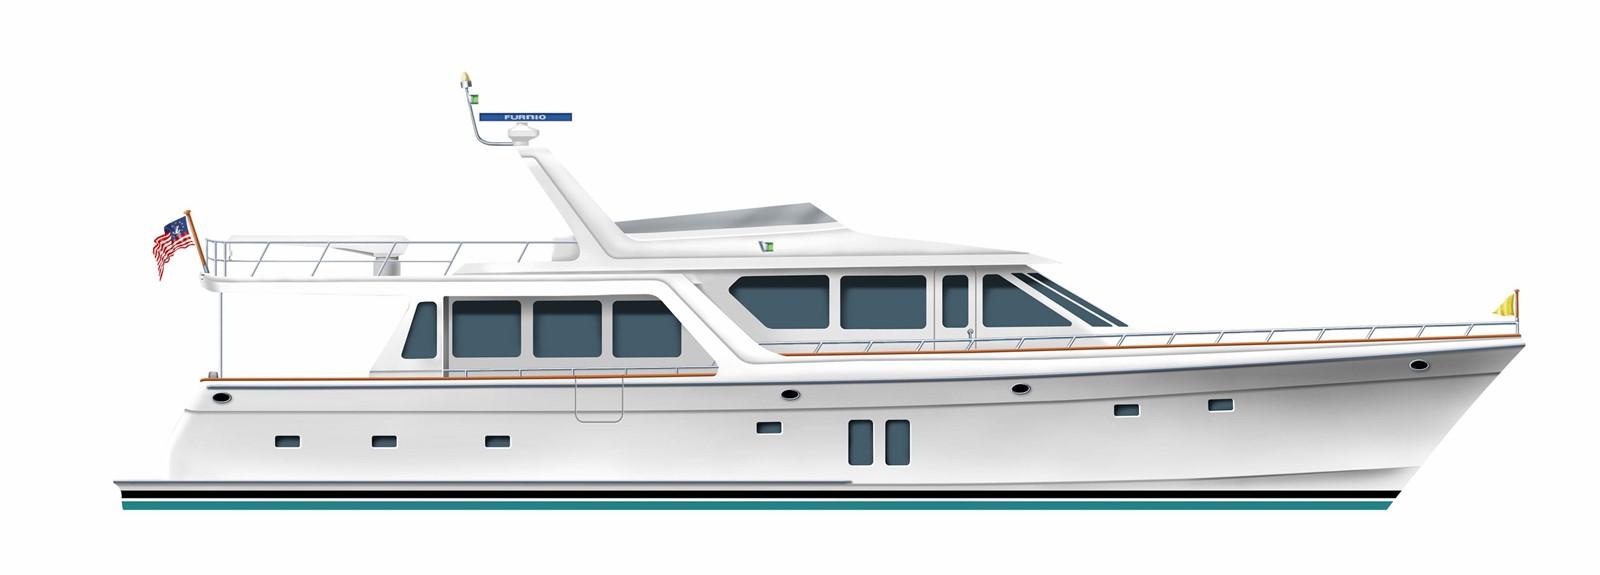 2020 OFFSHORE YACHTS 76/80 Motoryacht Motor Yacht 2571166